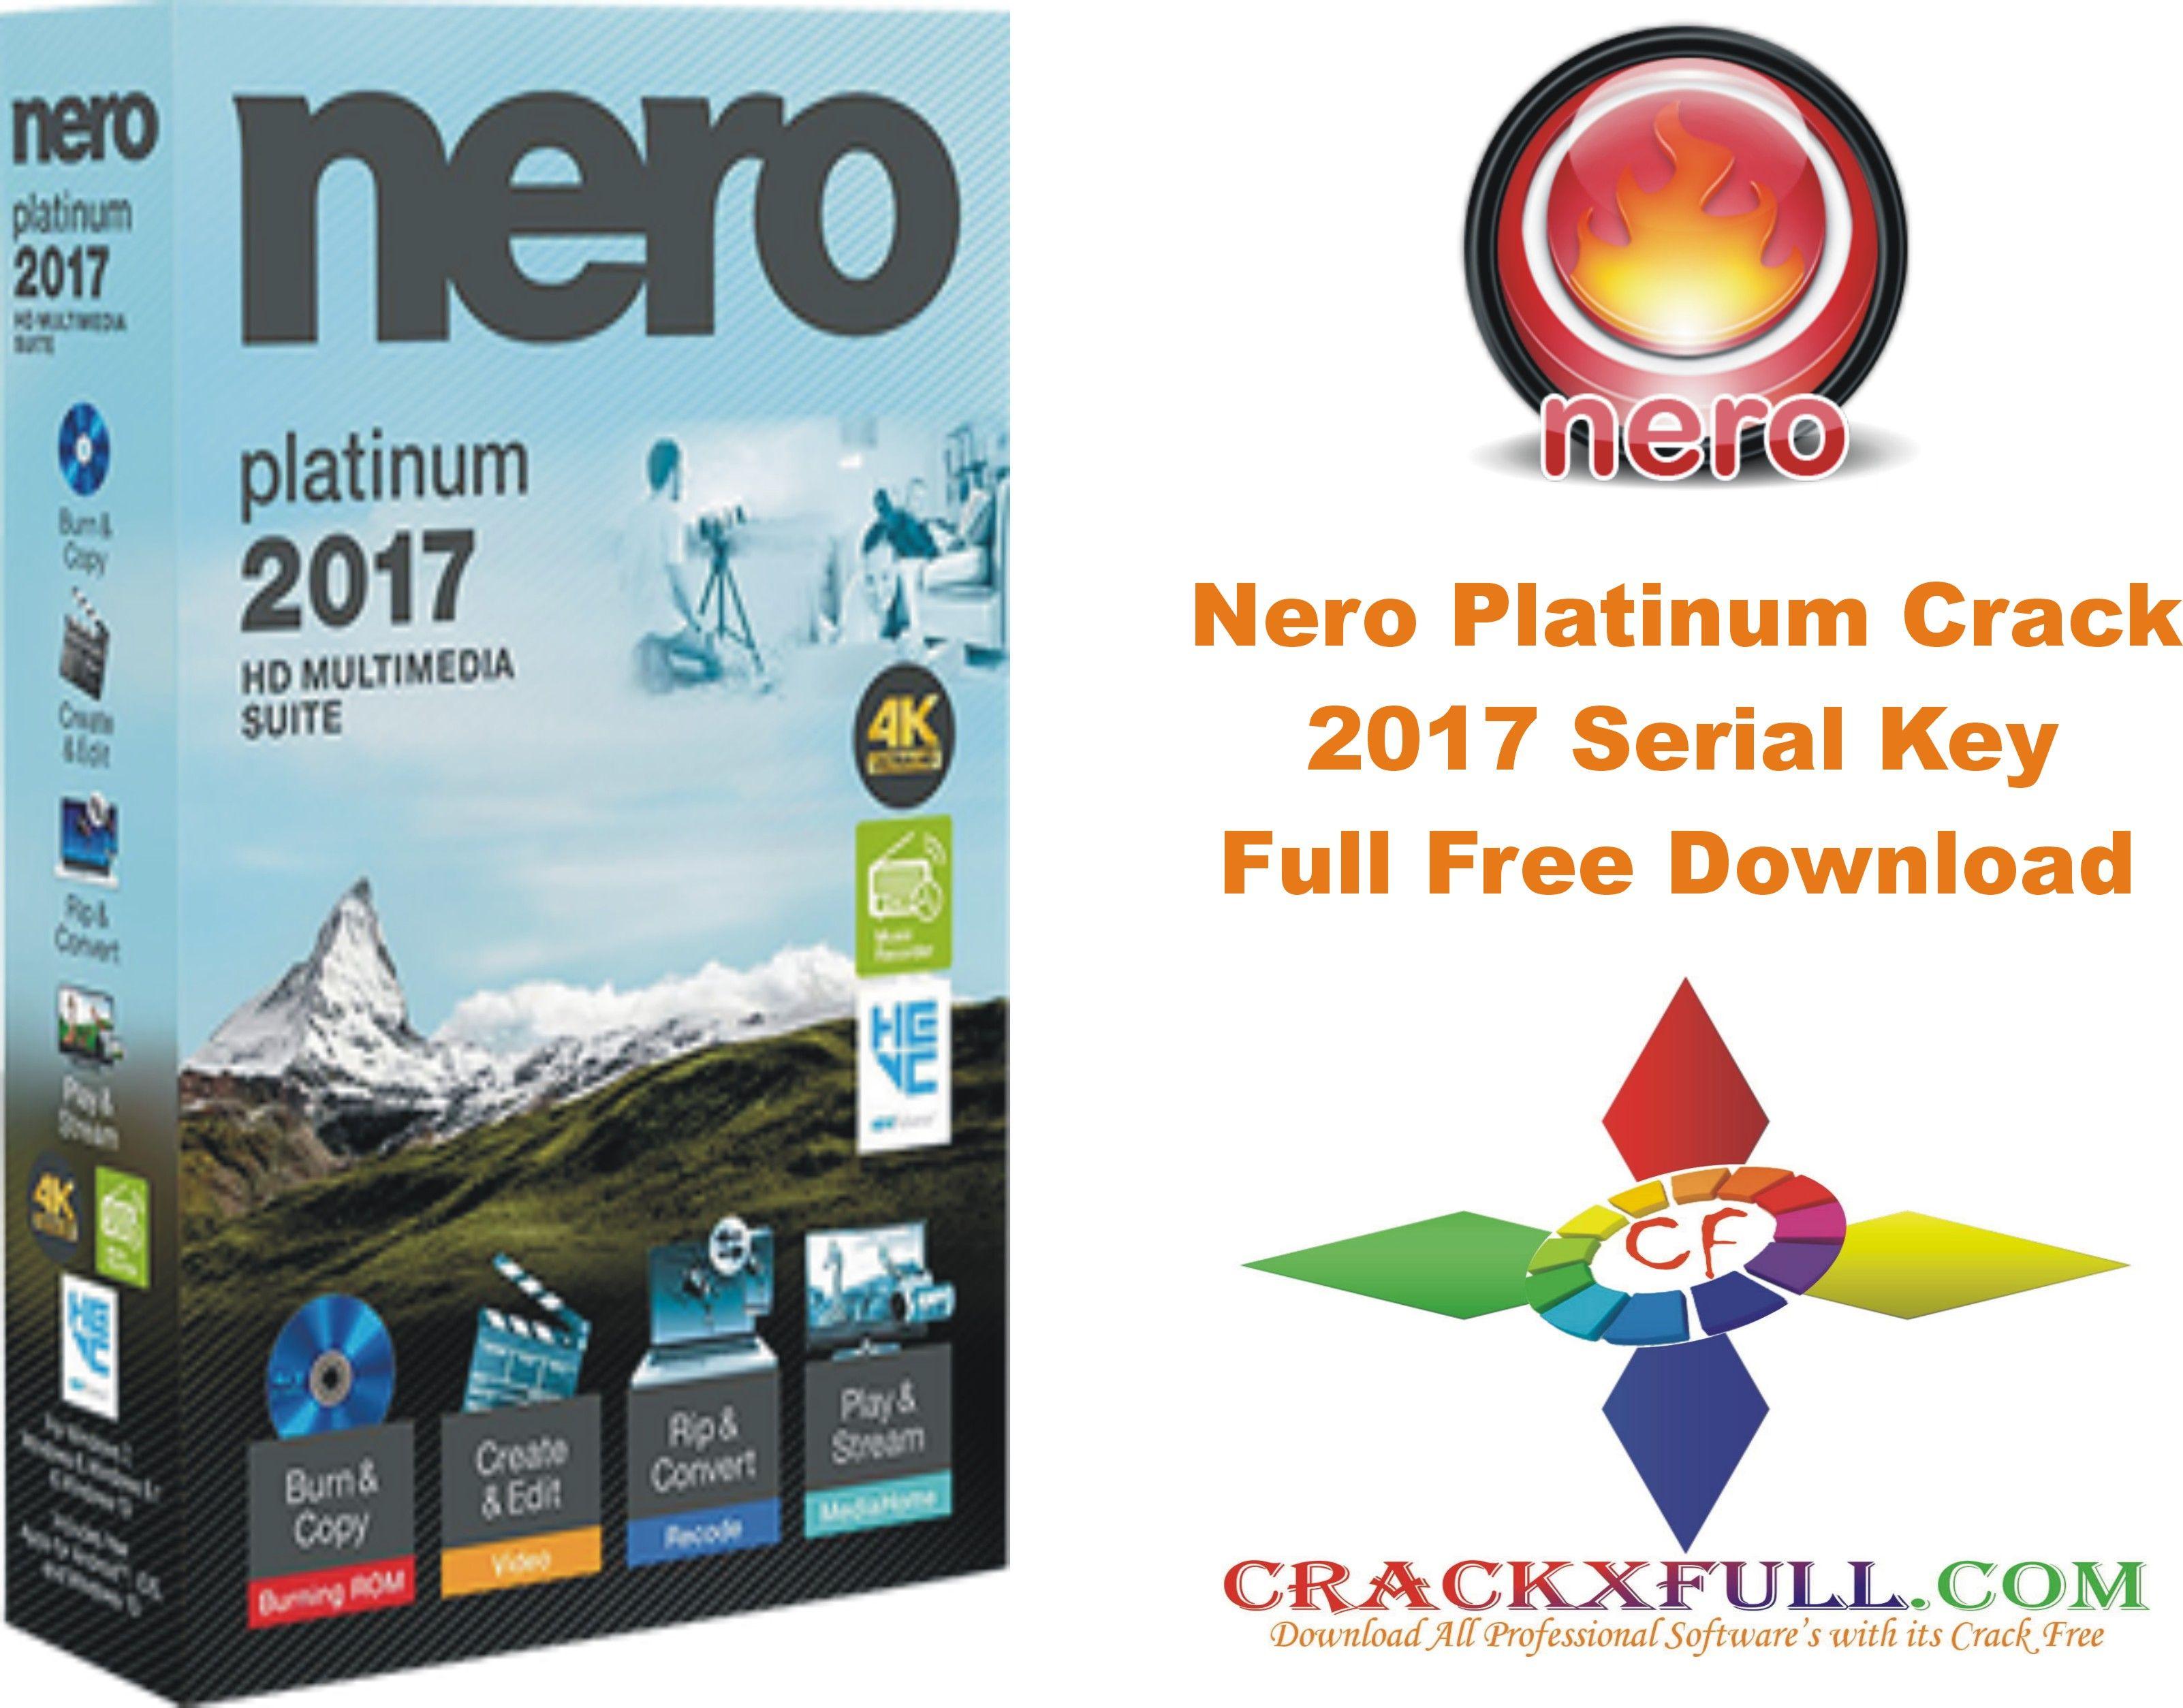 Download manycam enterprise 5 0 5 2 multilingual - Nero Platinum Crack 2017 Serial Key Full Free Download Nero Platinum Crack Download Nero